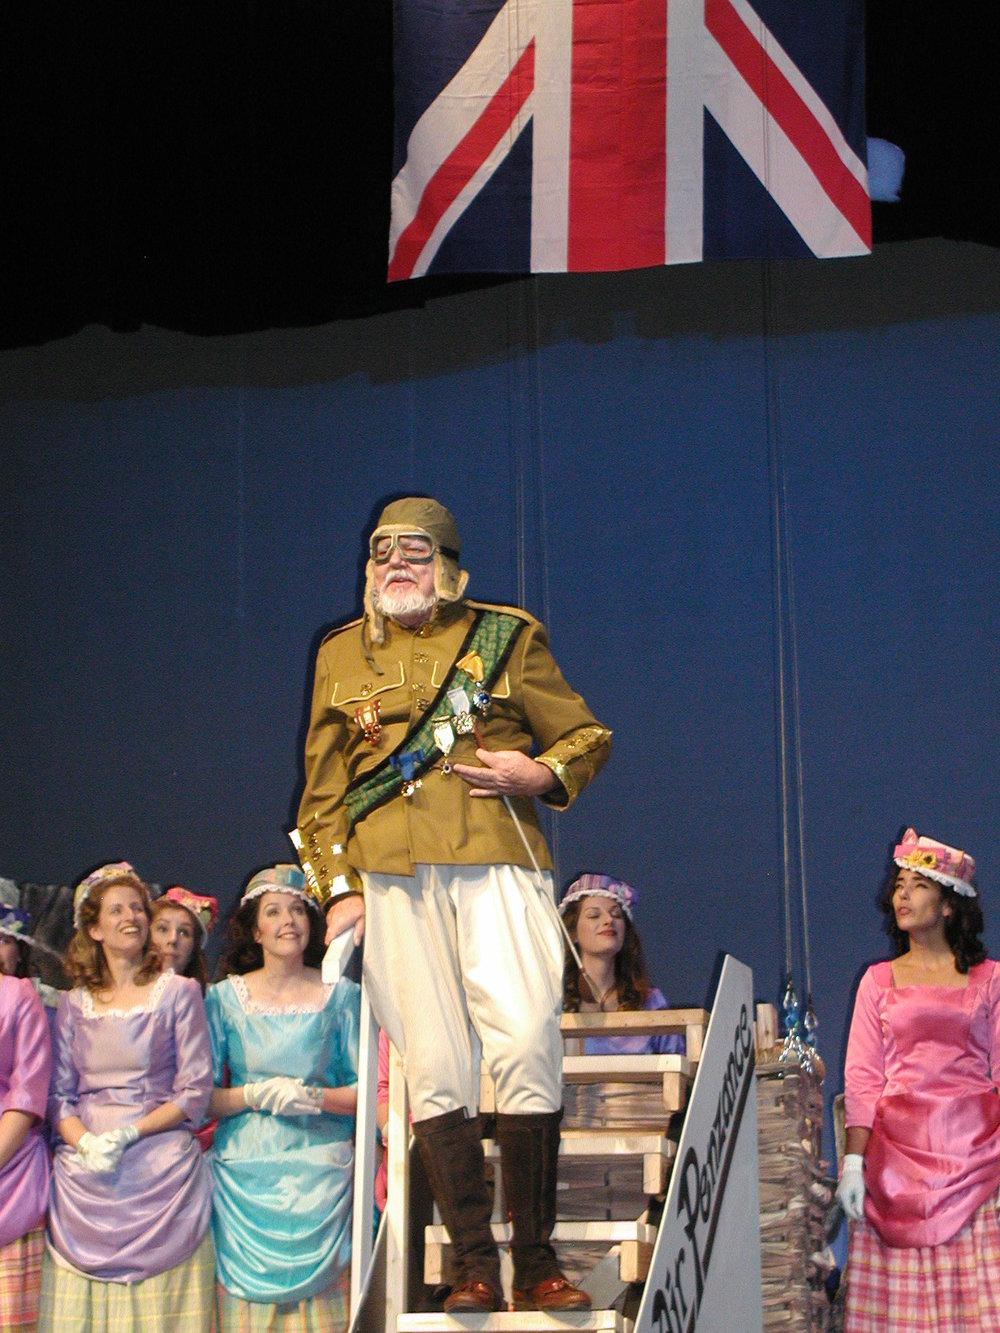 Pirates-rehearsal-10.12.05-082.jpg